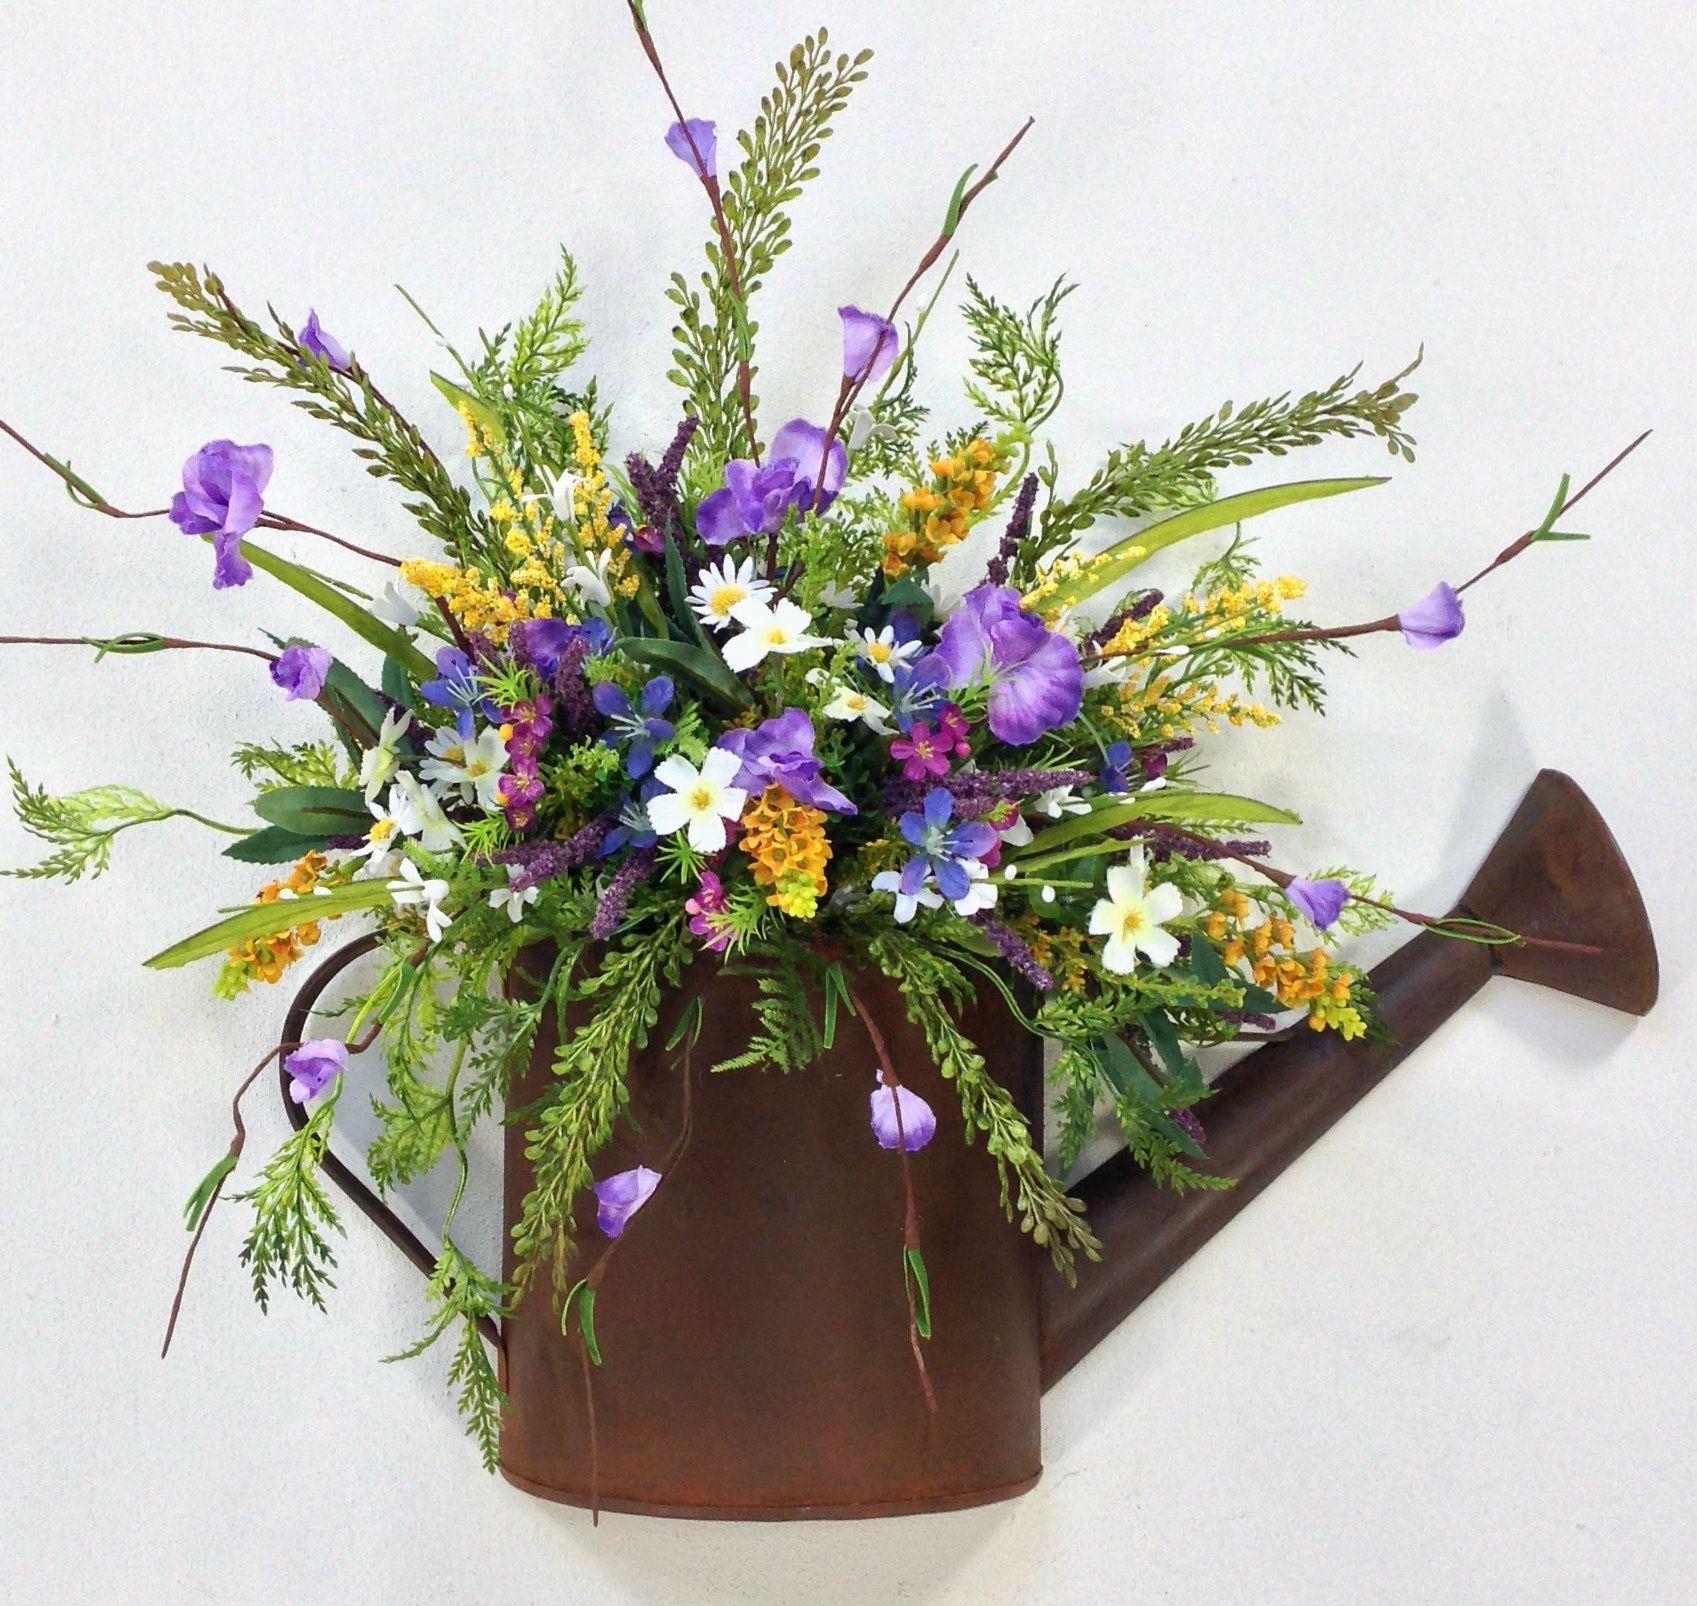 Large Arrangement Featuring Asiatic and Calla Lilies | DIY ... |Large Spring Floral Arrangements